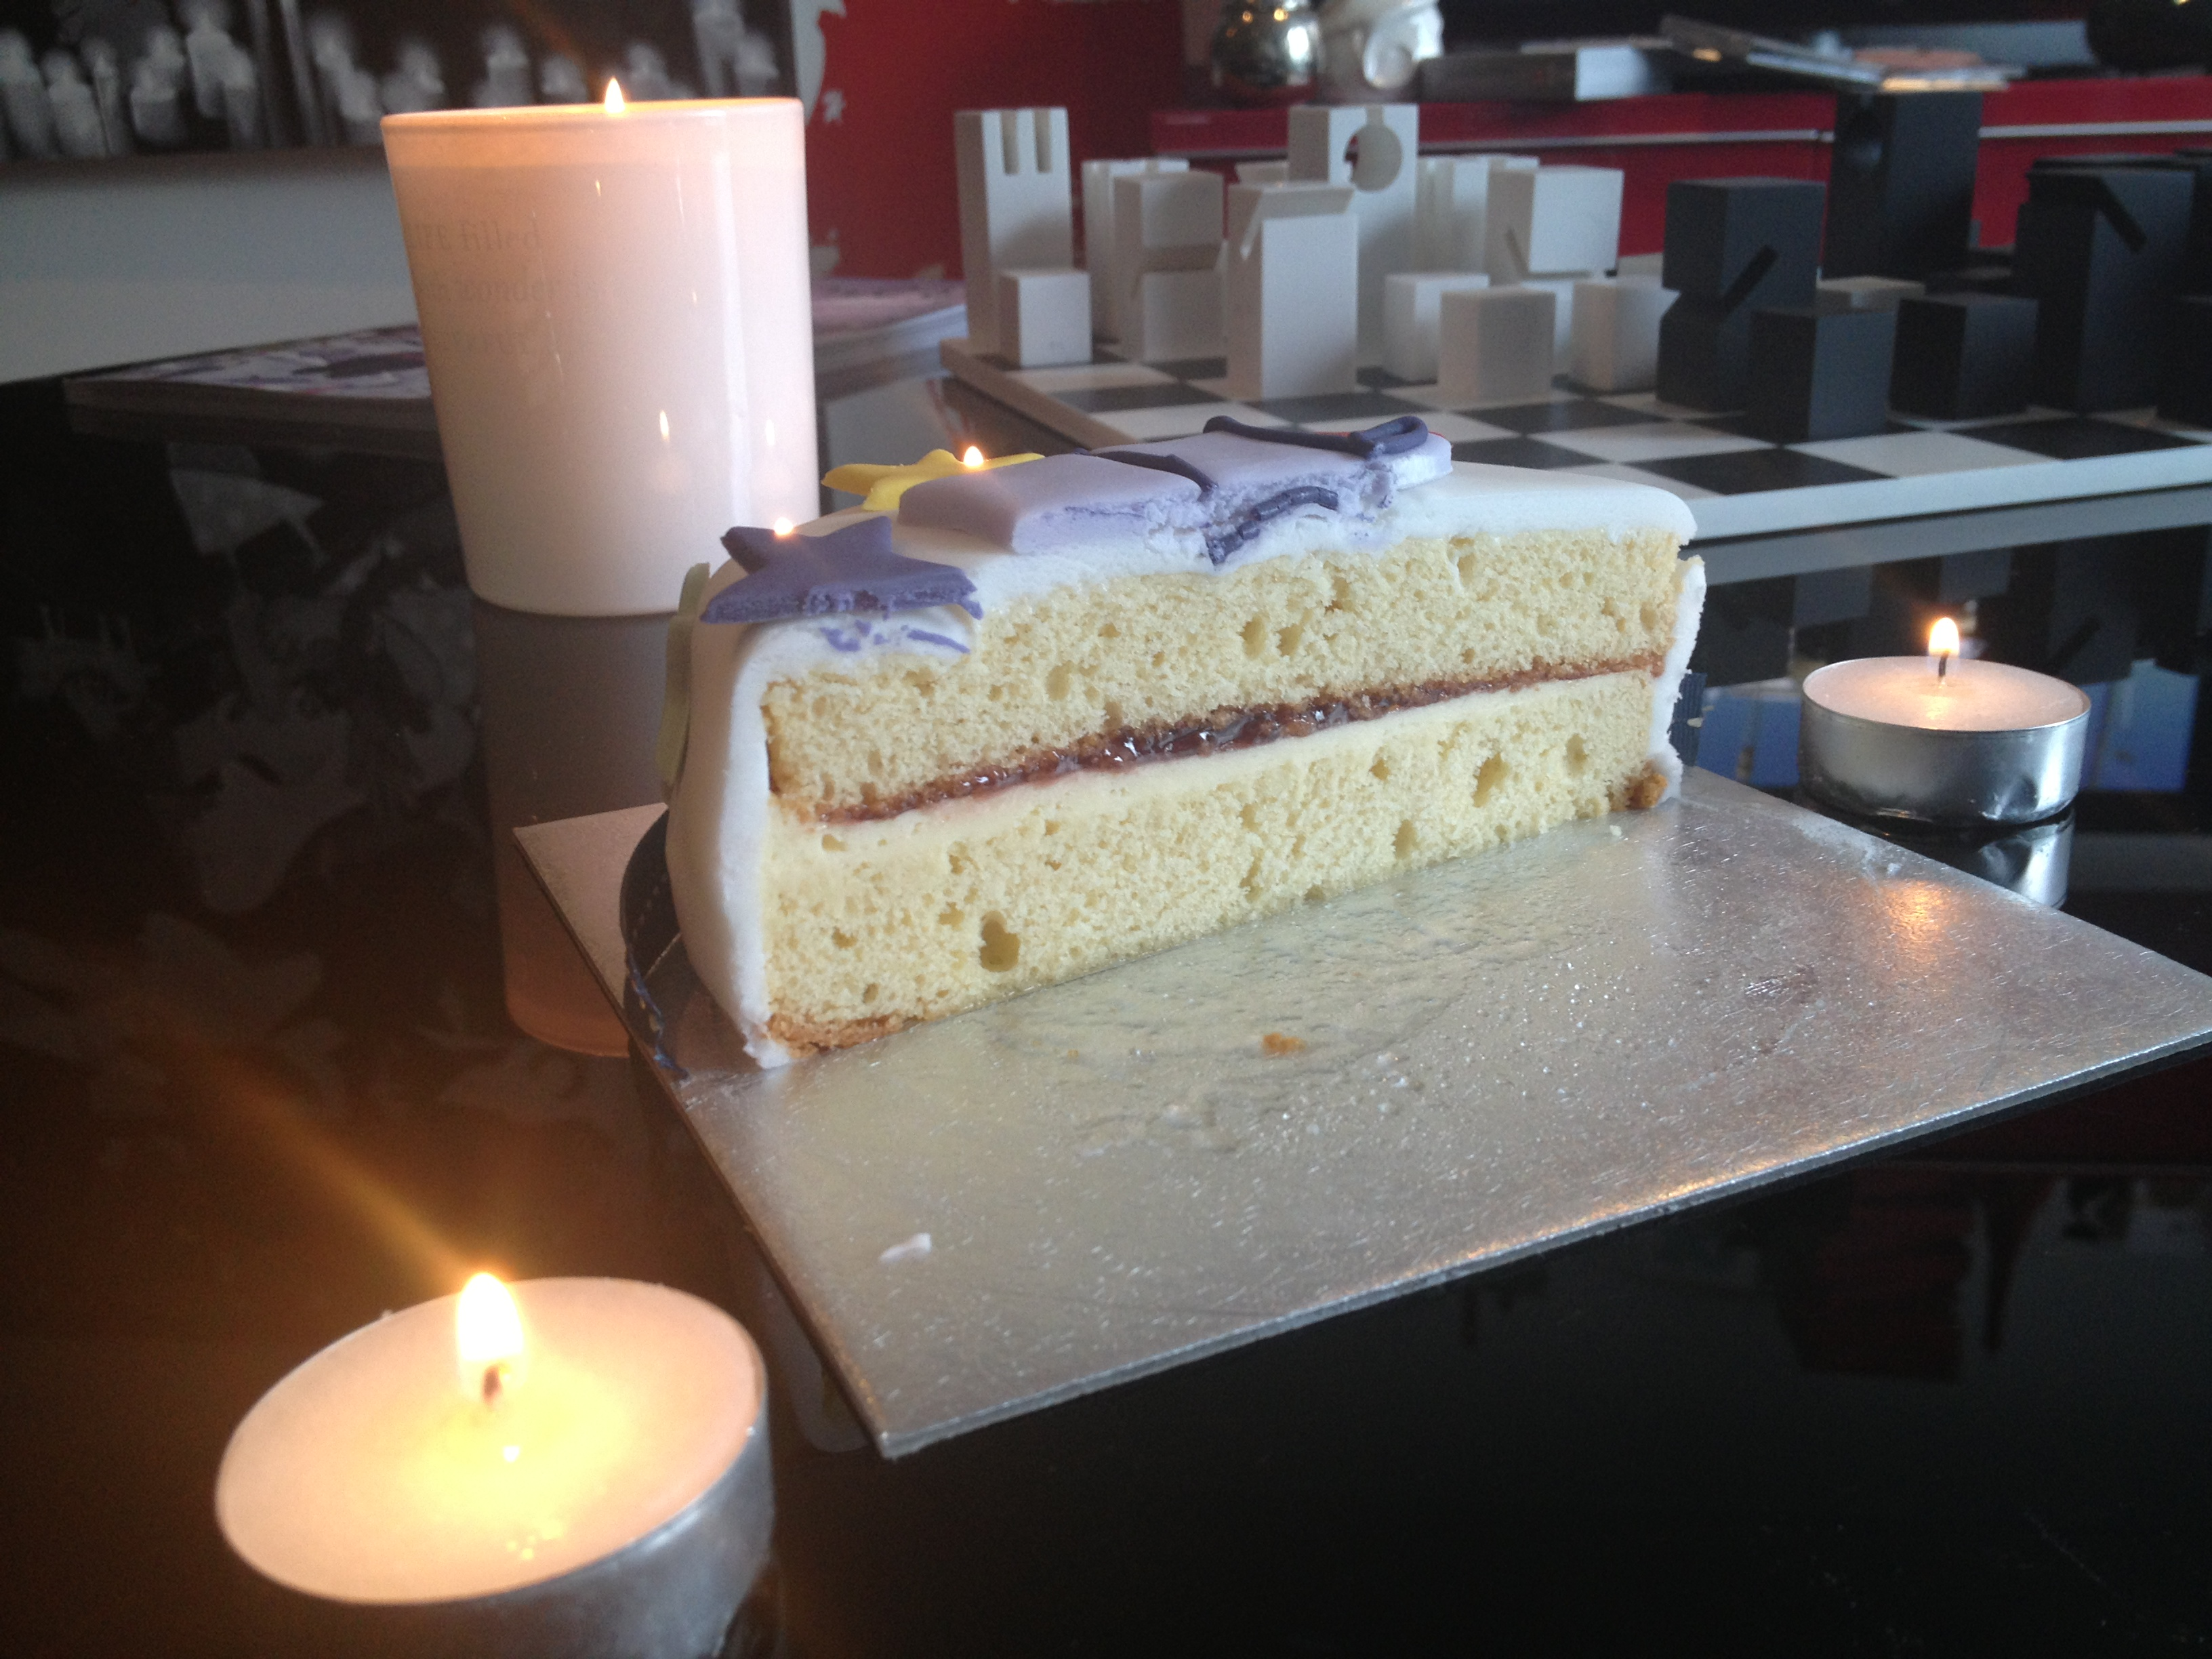 My Half Birthday Cake